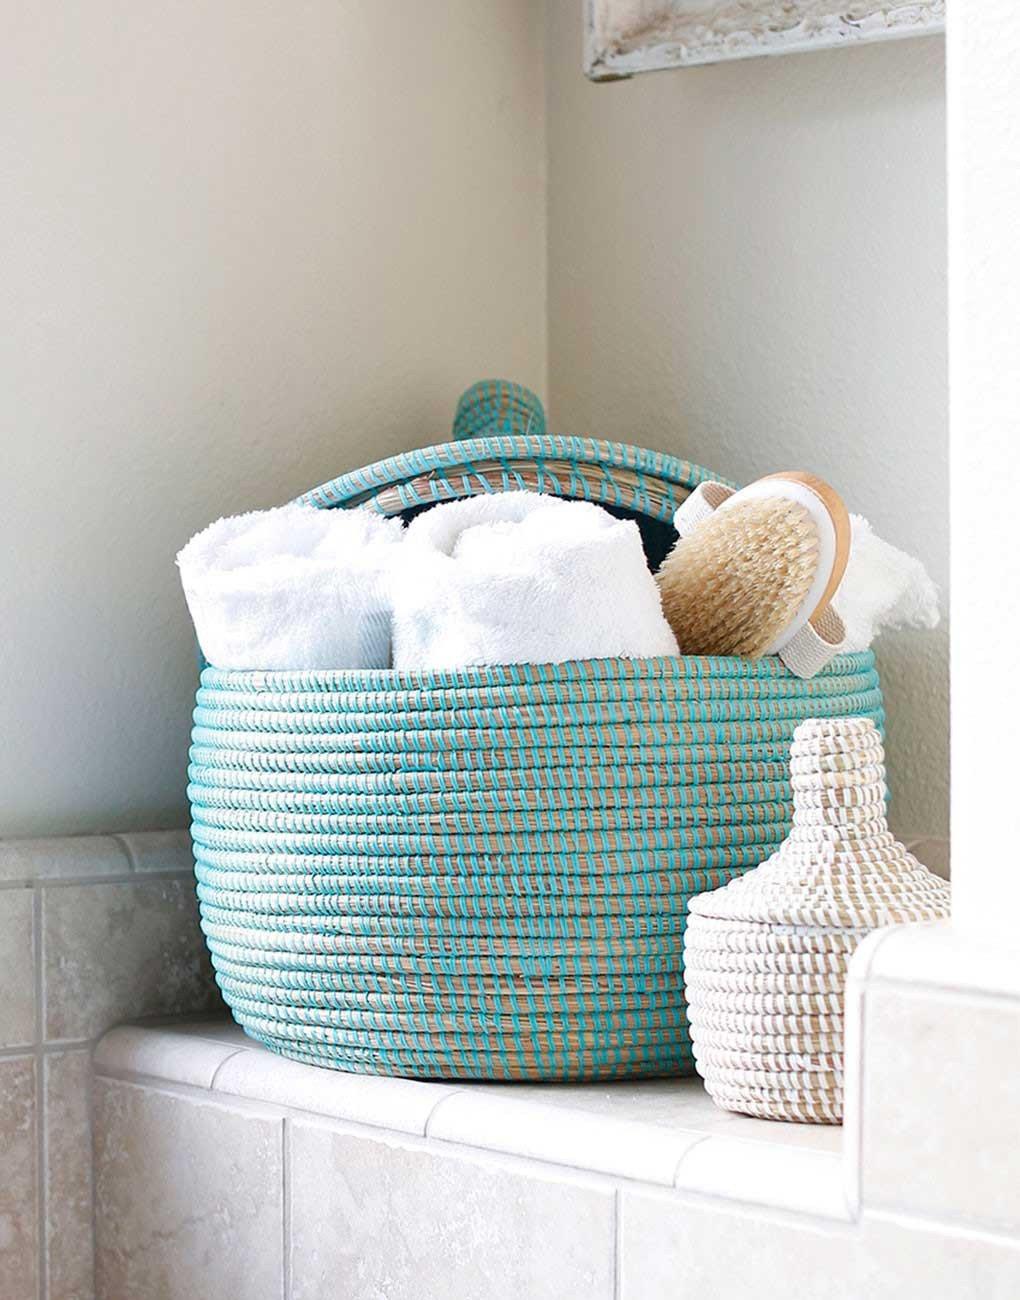 Powder-room-basket-in-mint